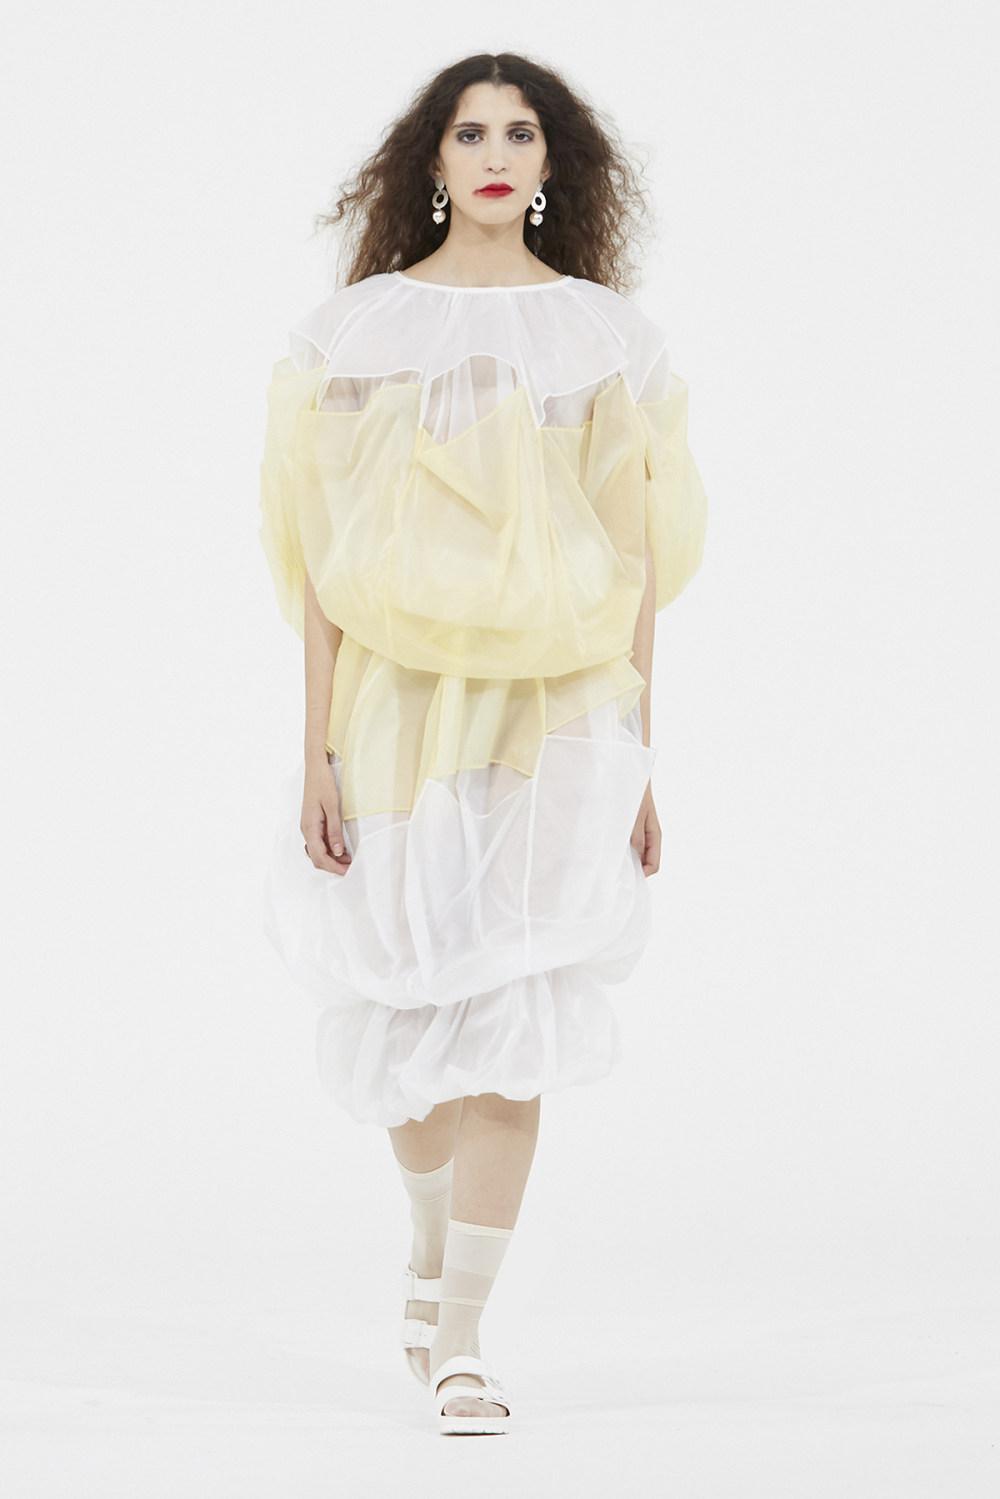 Nicolas Andreas Taralis时装系列技术织物矩形条纹被缝合在一起-17.jpg